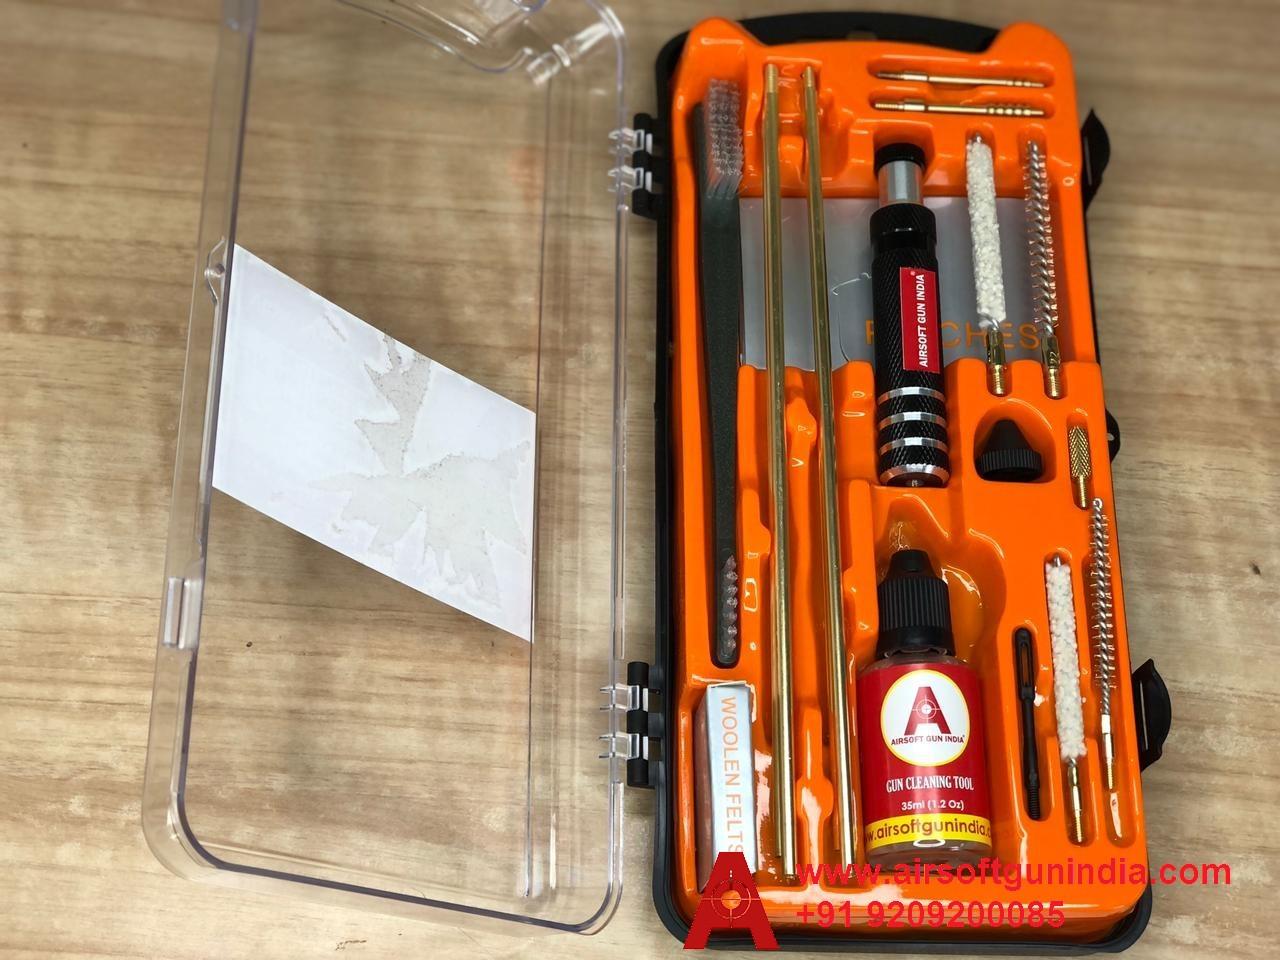 Premium Gun Cleaning Kit For .177 Co2 Pistol / Revolver / Rifle By Airsoft Gun India